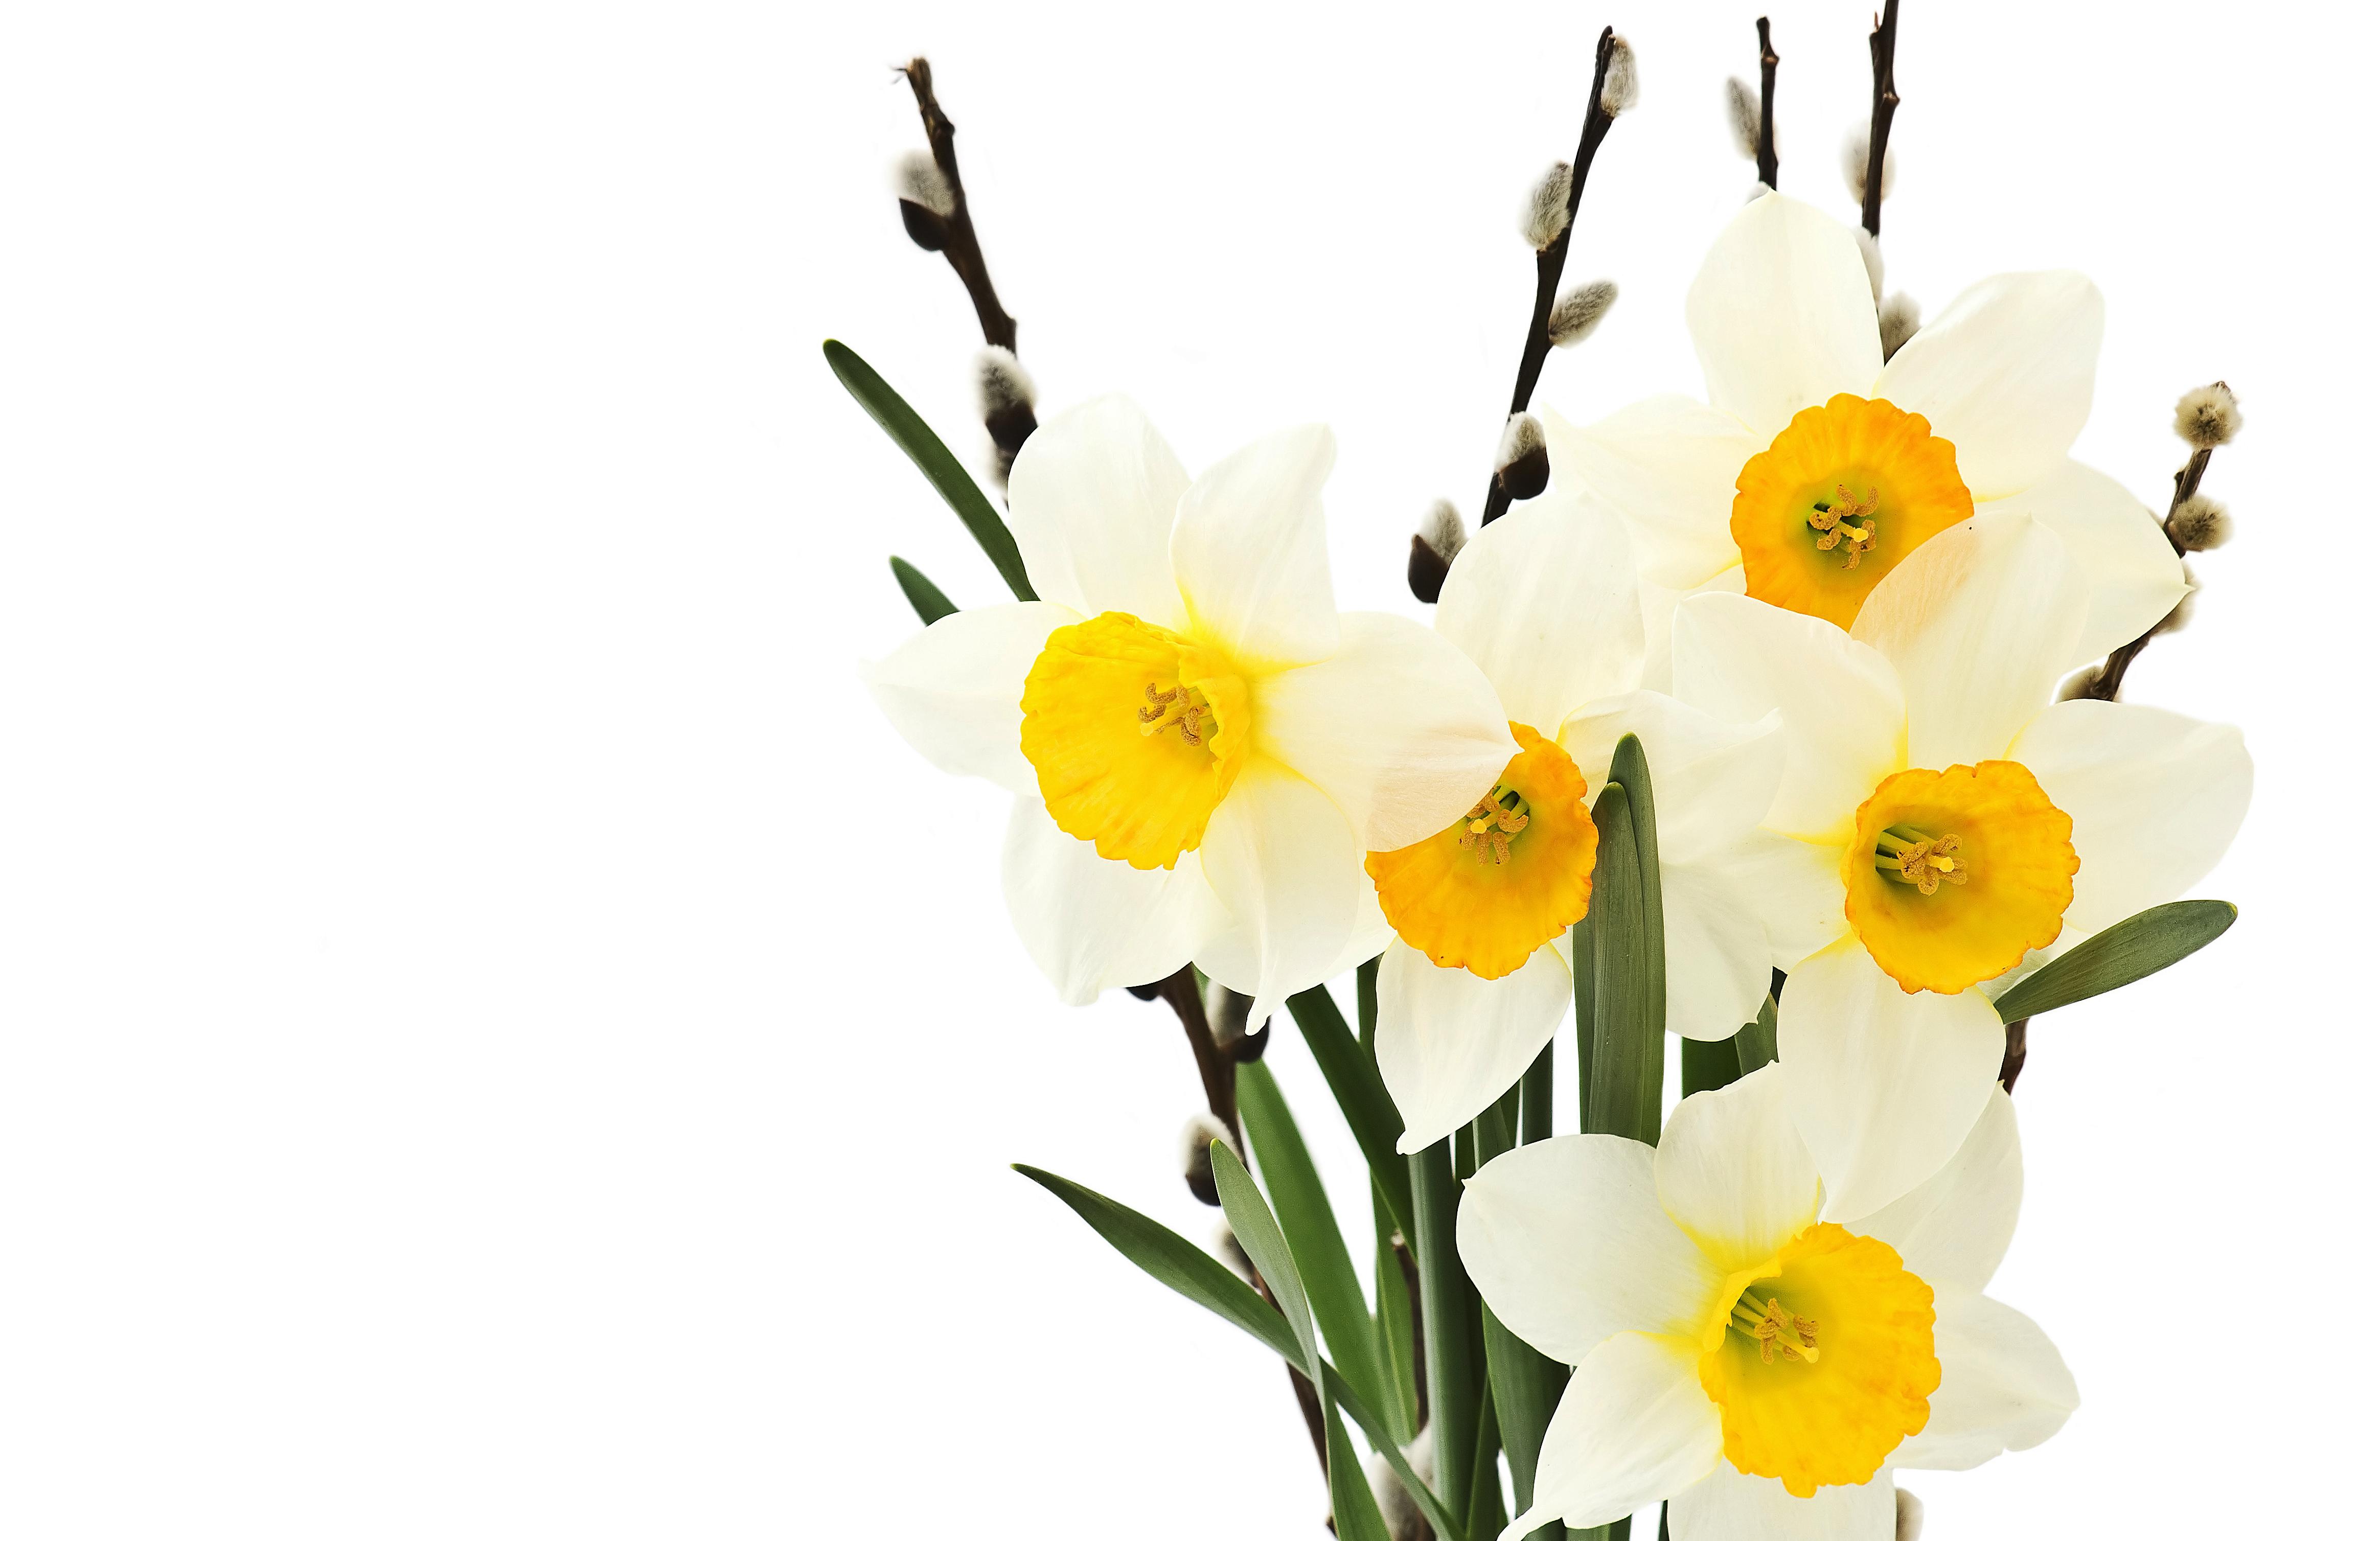 daffodils-photo-71